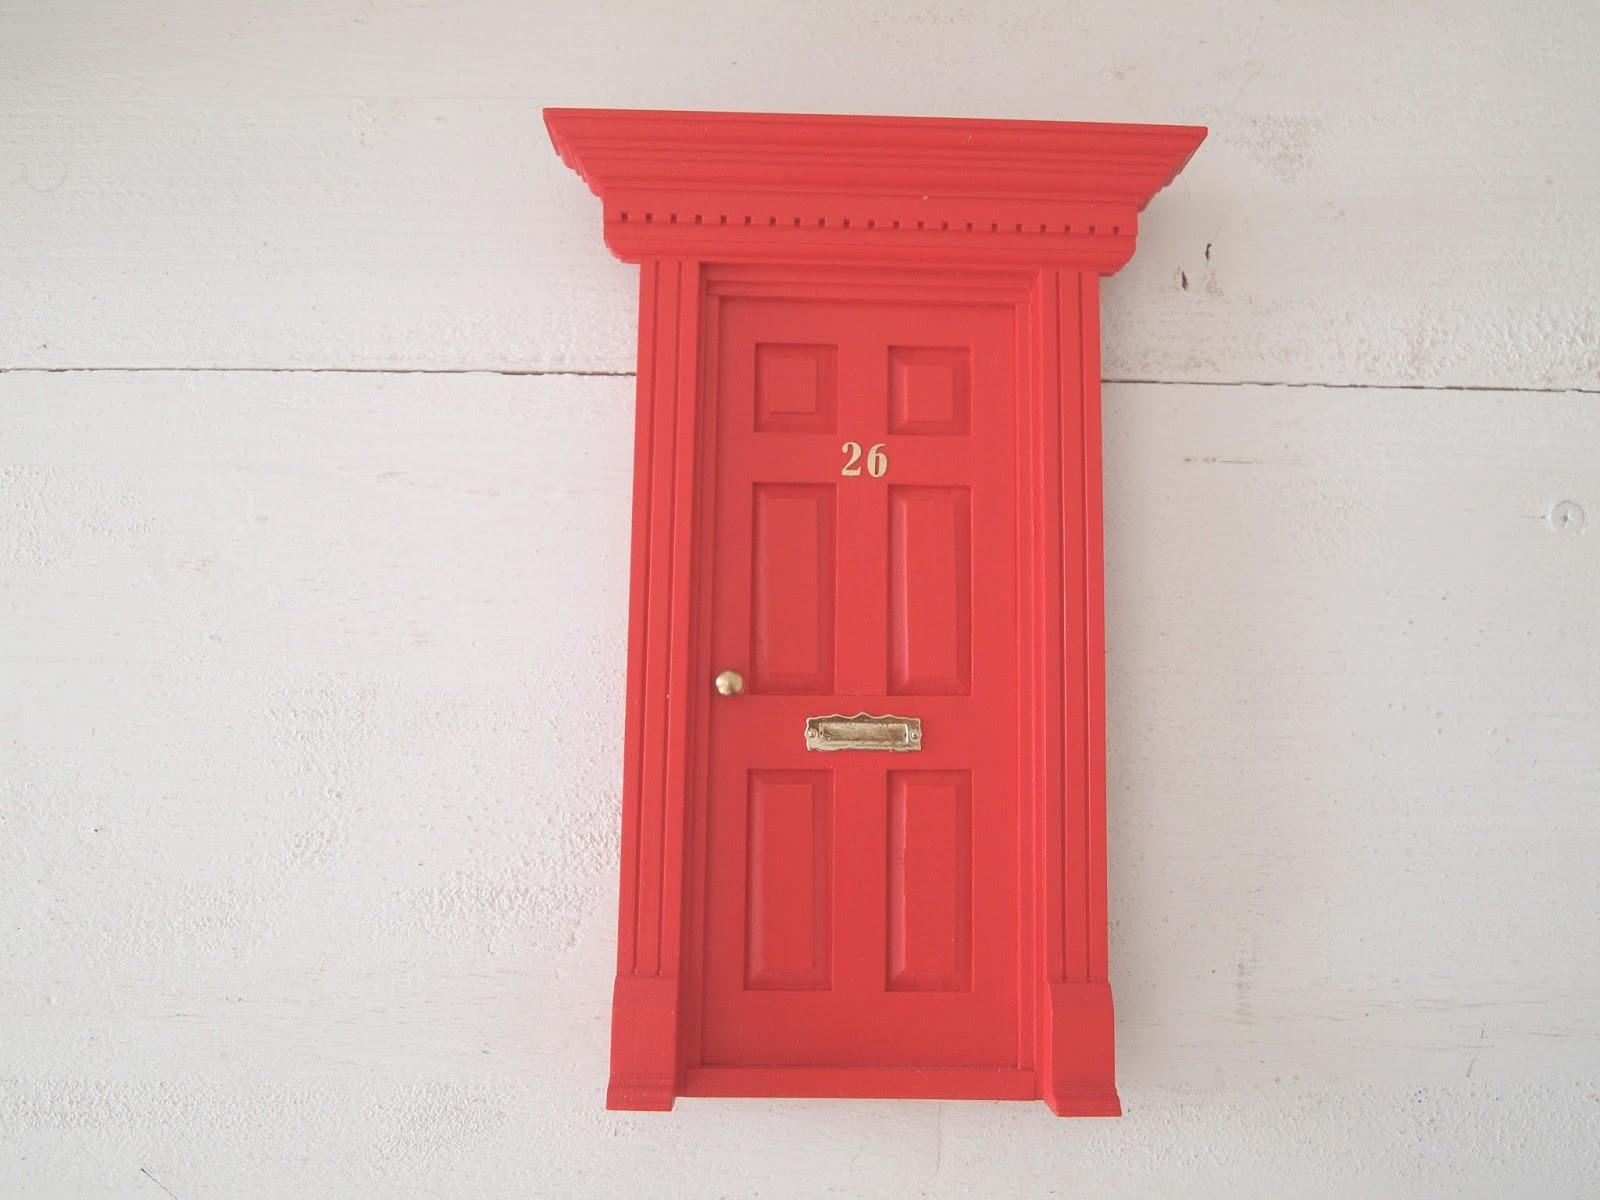 La cesta de mi bici nuestra puerta del ratoncito p rez - Puerta ratoncito perez el corte ingles ...